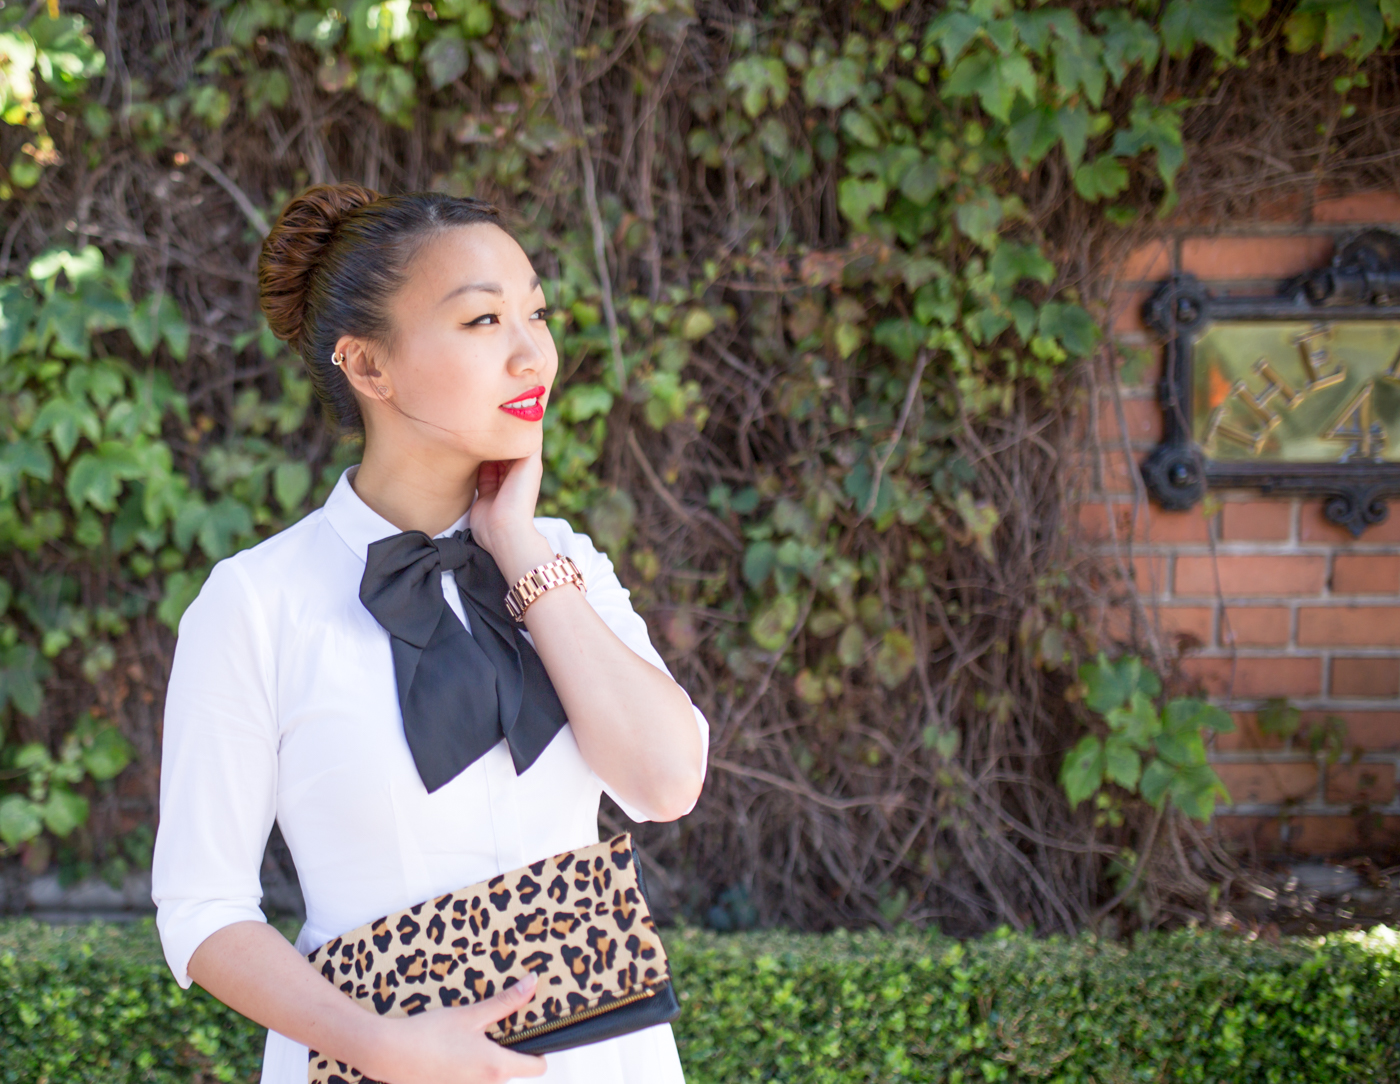 ASOS Oversized Bow Tie | via The Chic Diary